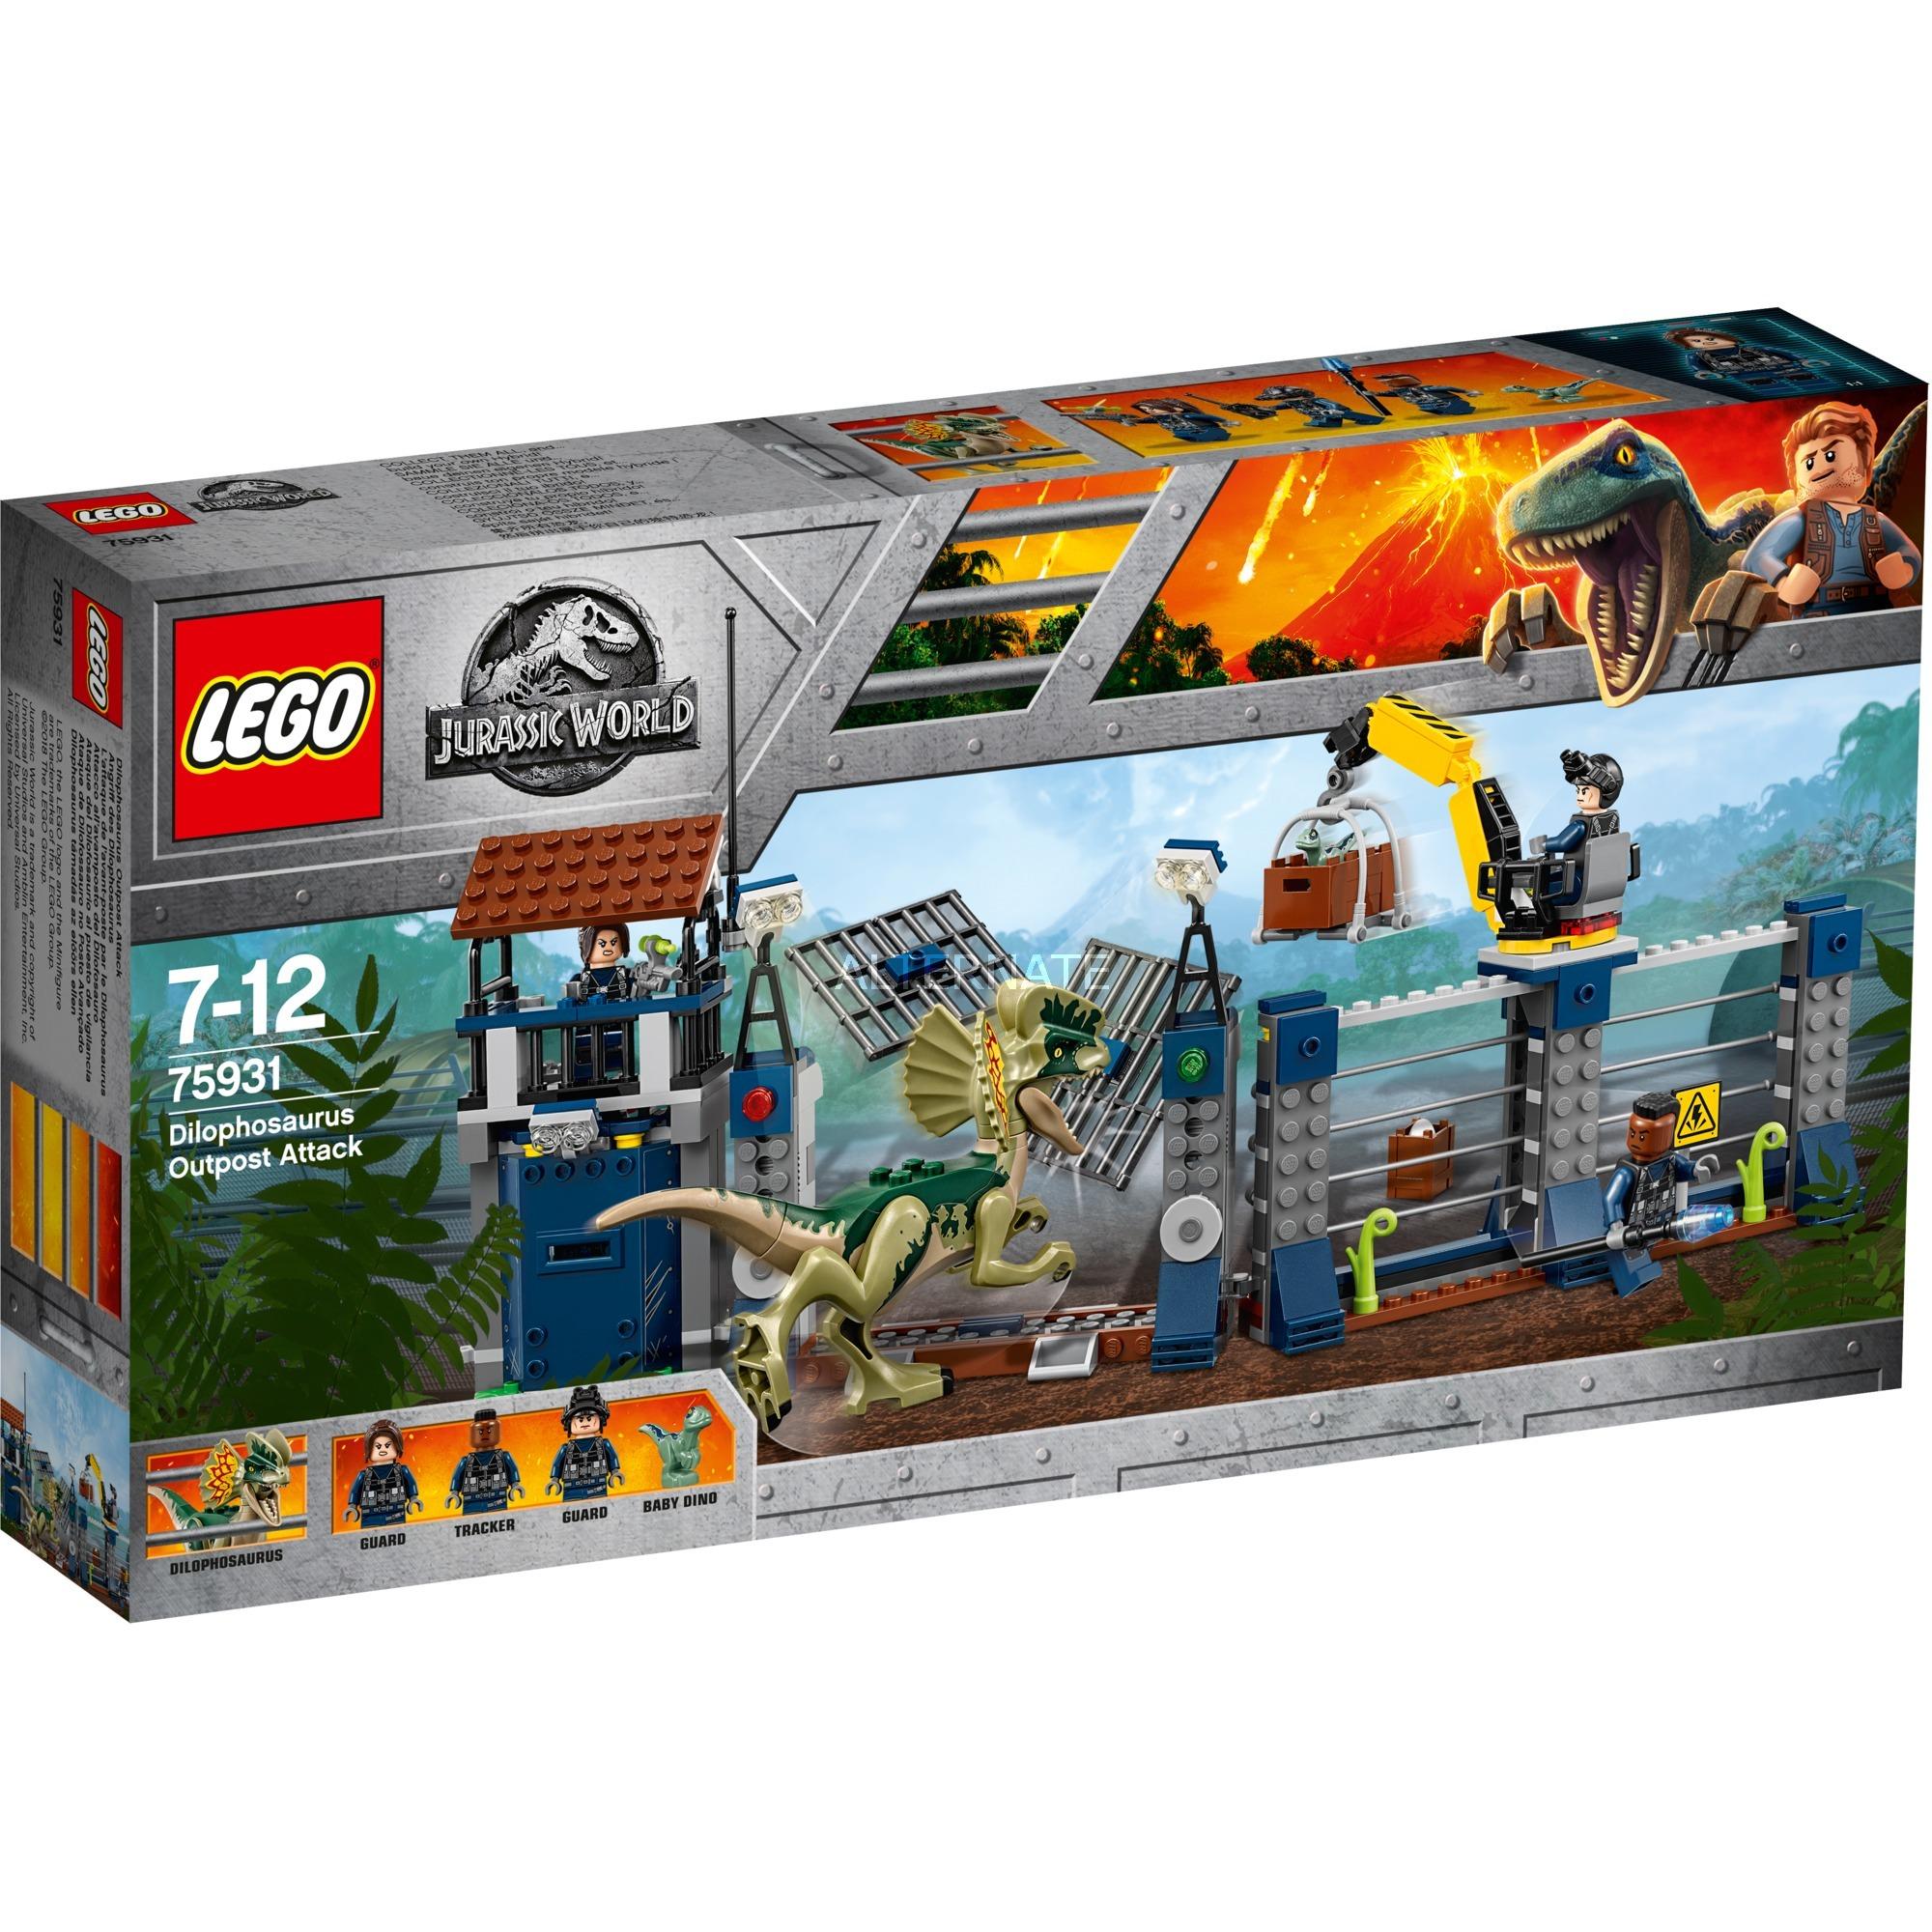 Lego Jurassic World 75931 Ataque Del Dilofosauro Juegos De Construccion